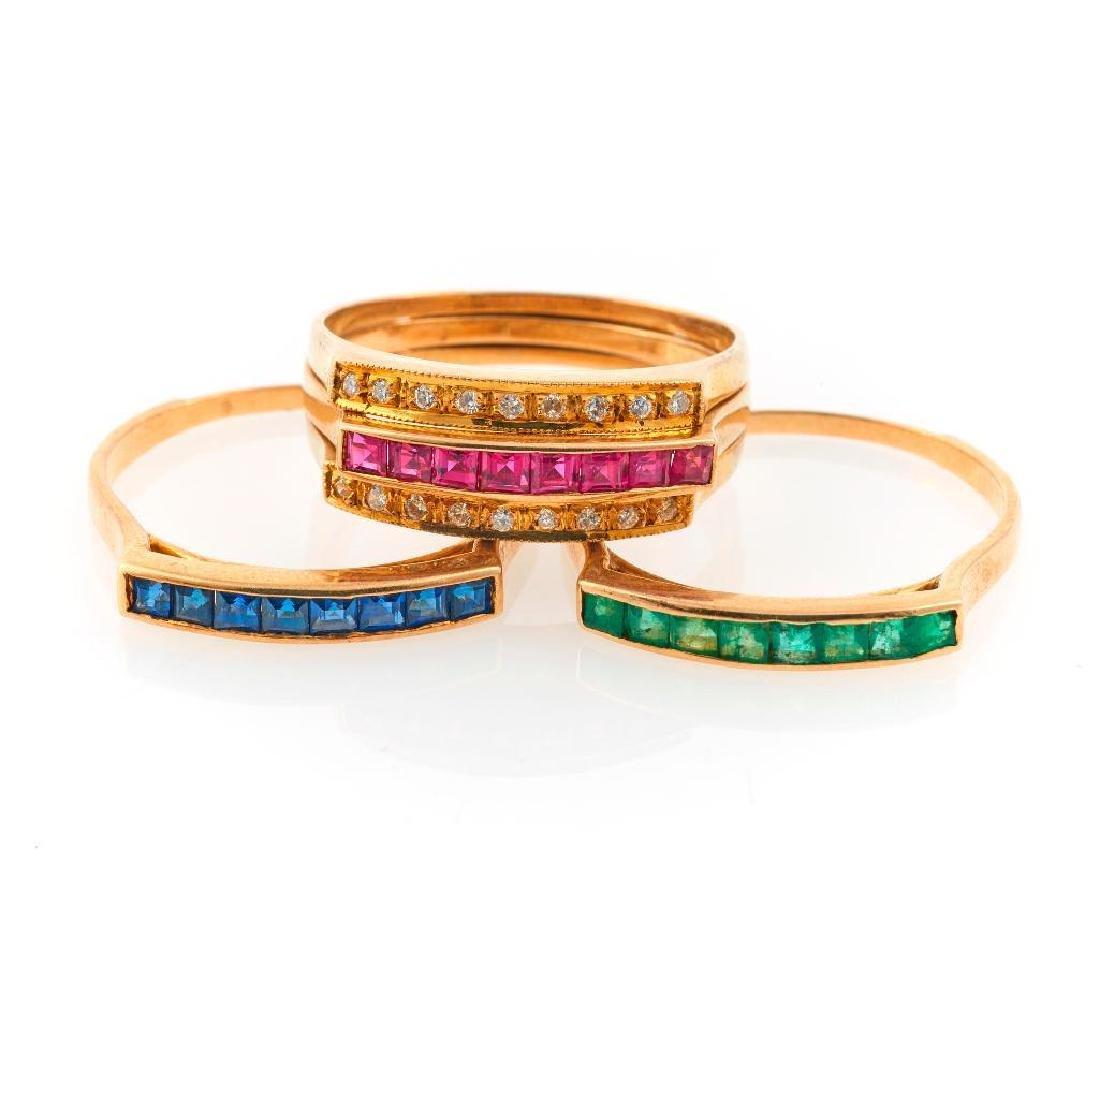 Ruby, sapphire, emerald, diamond & gold triple ring set